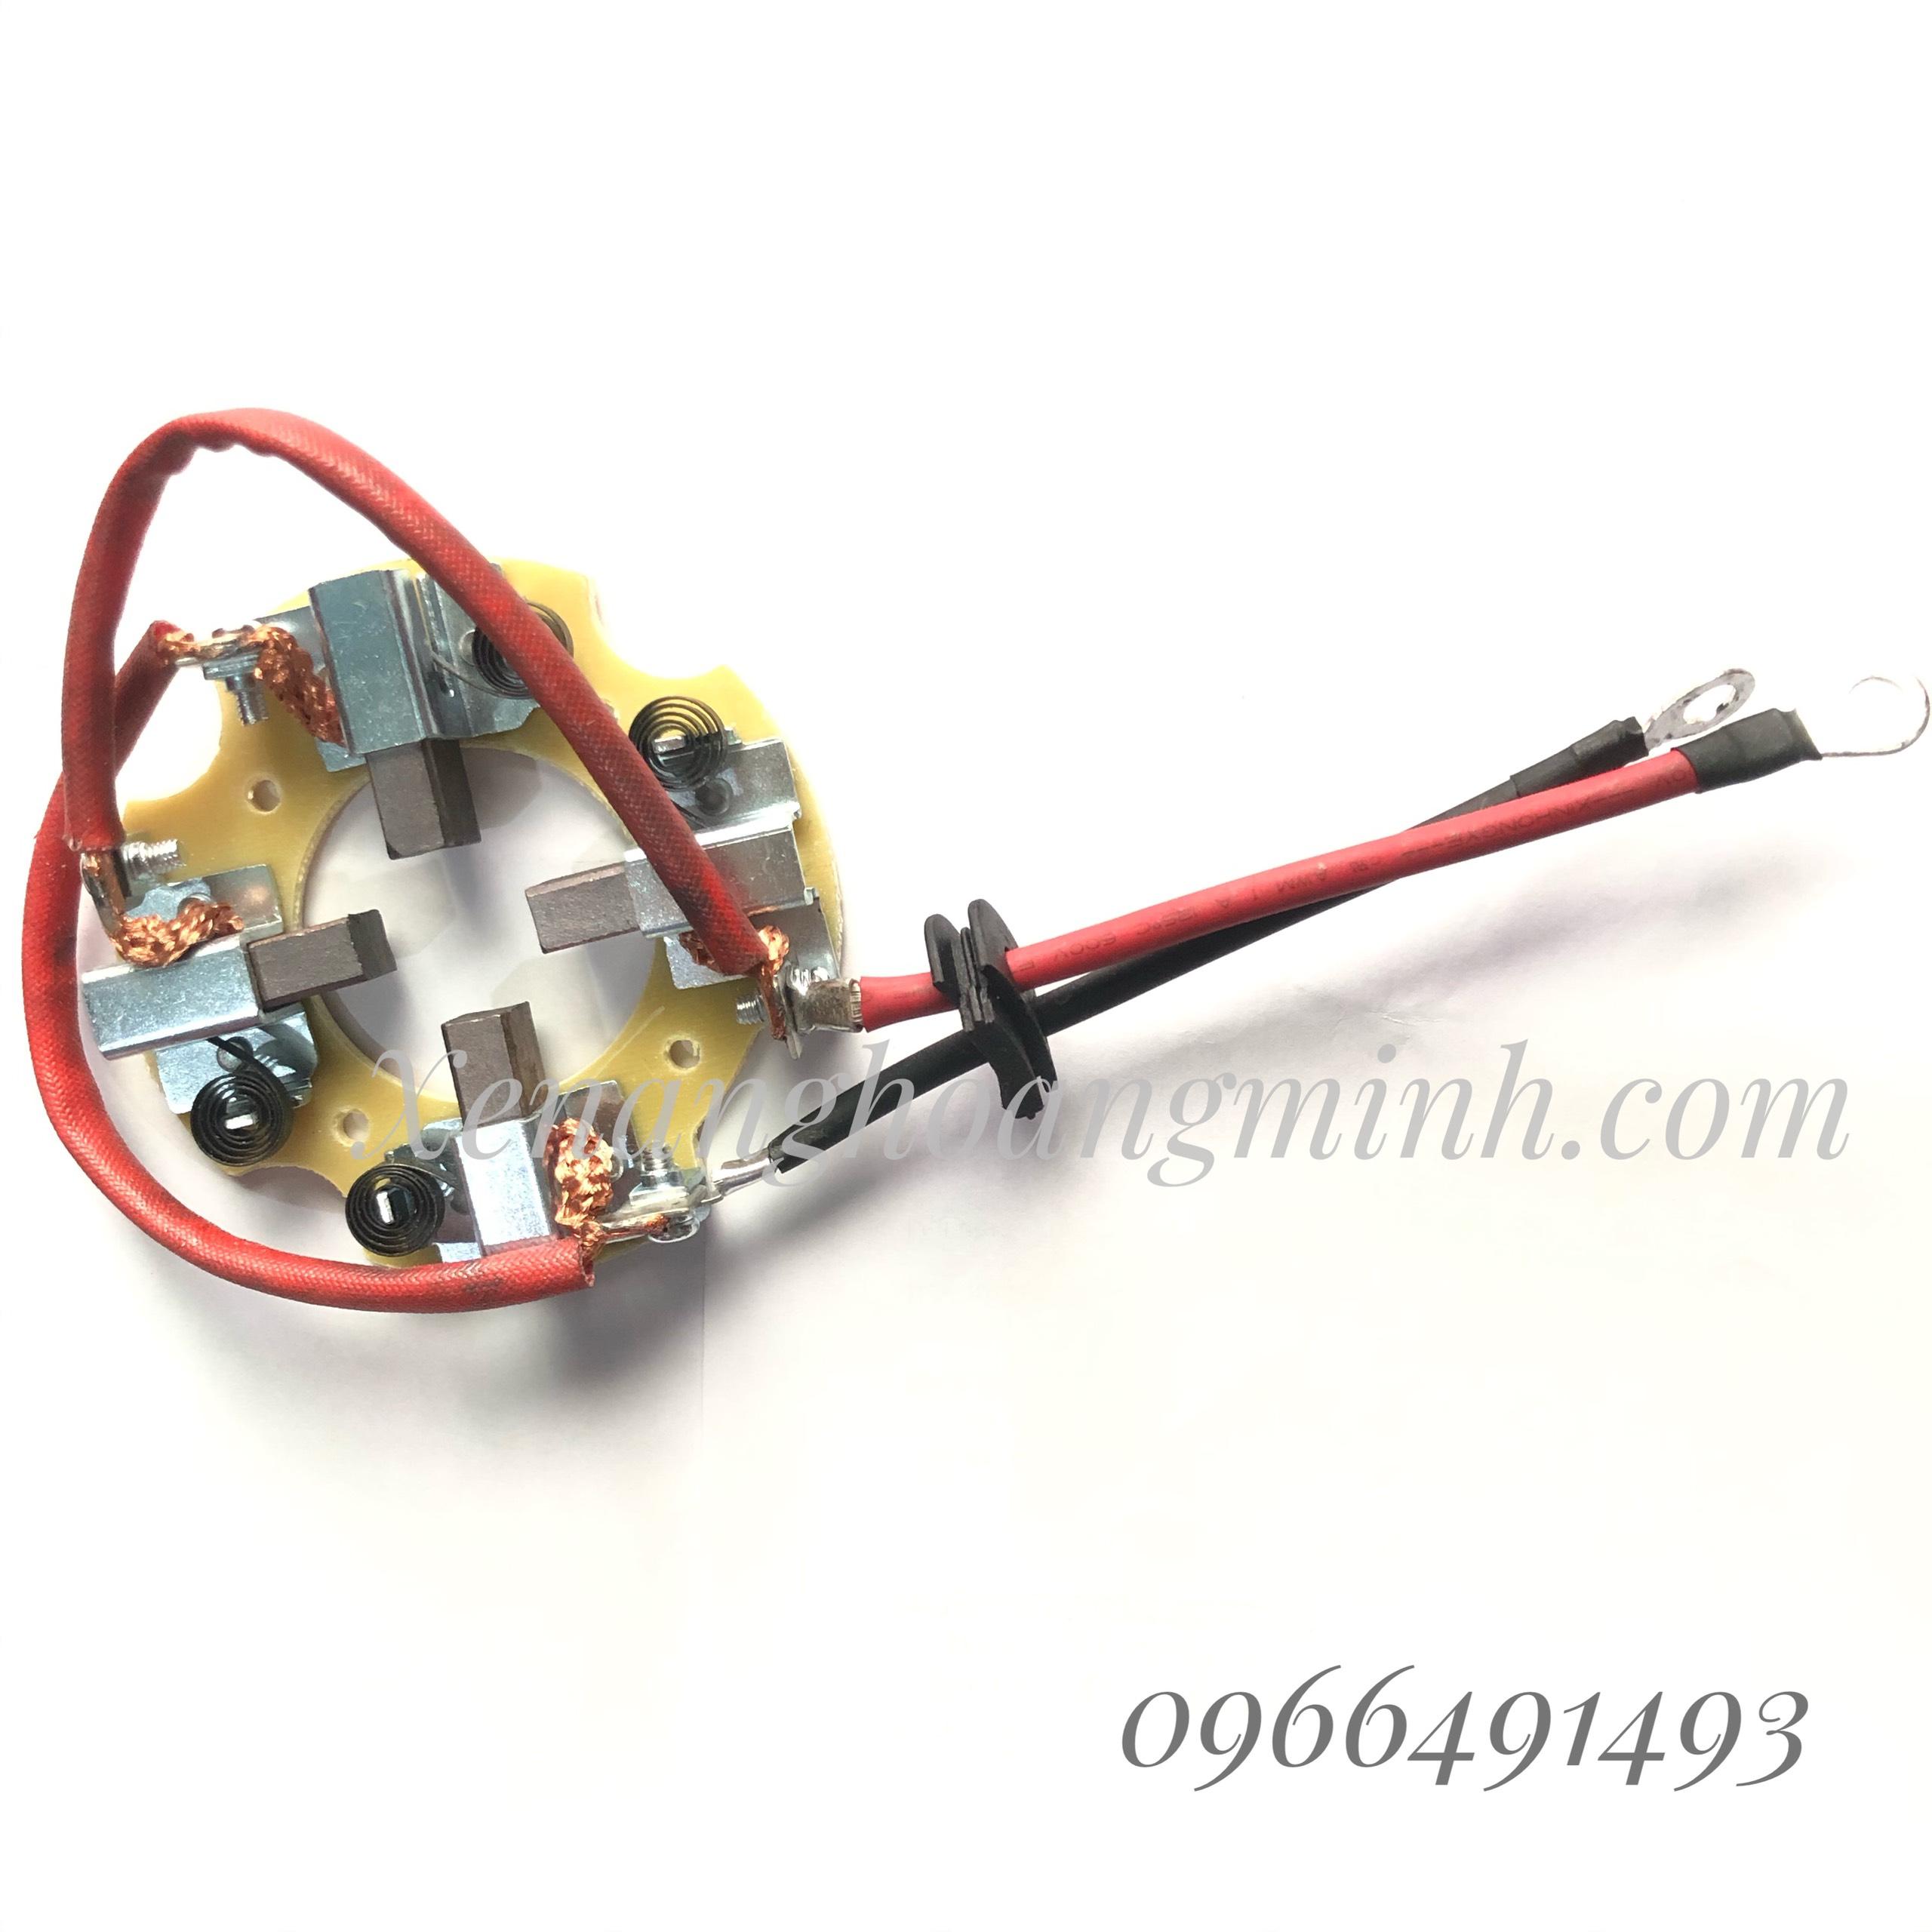 choi than 24V 650W